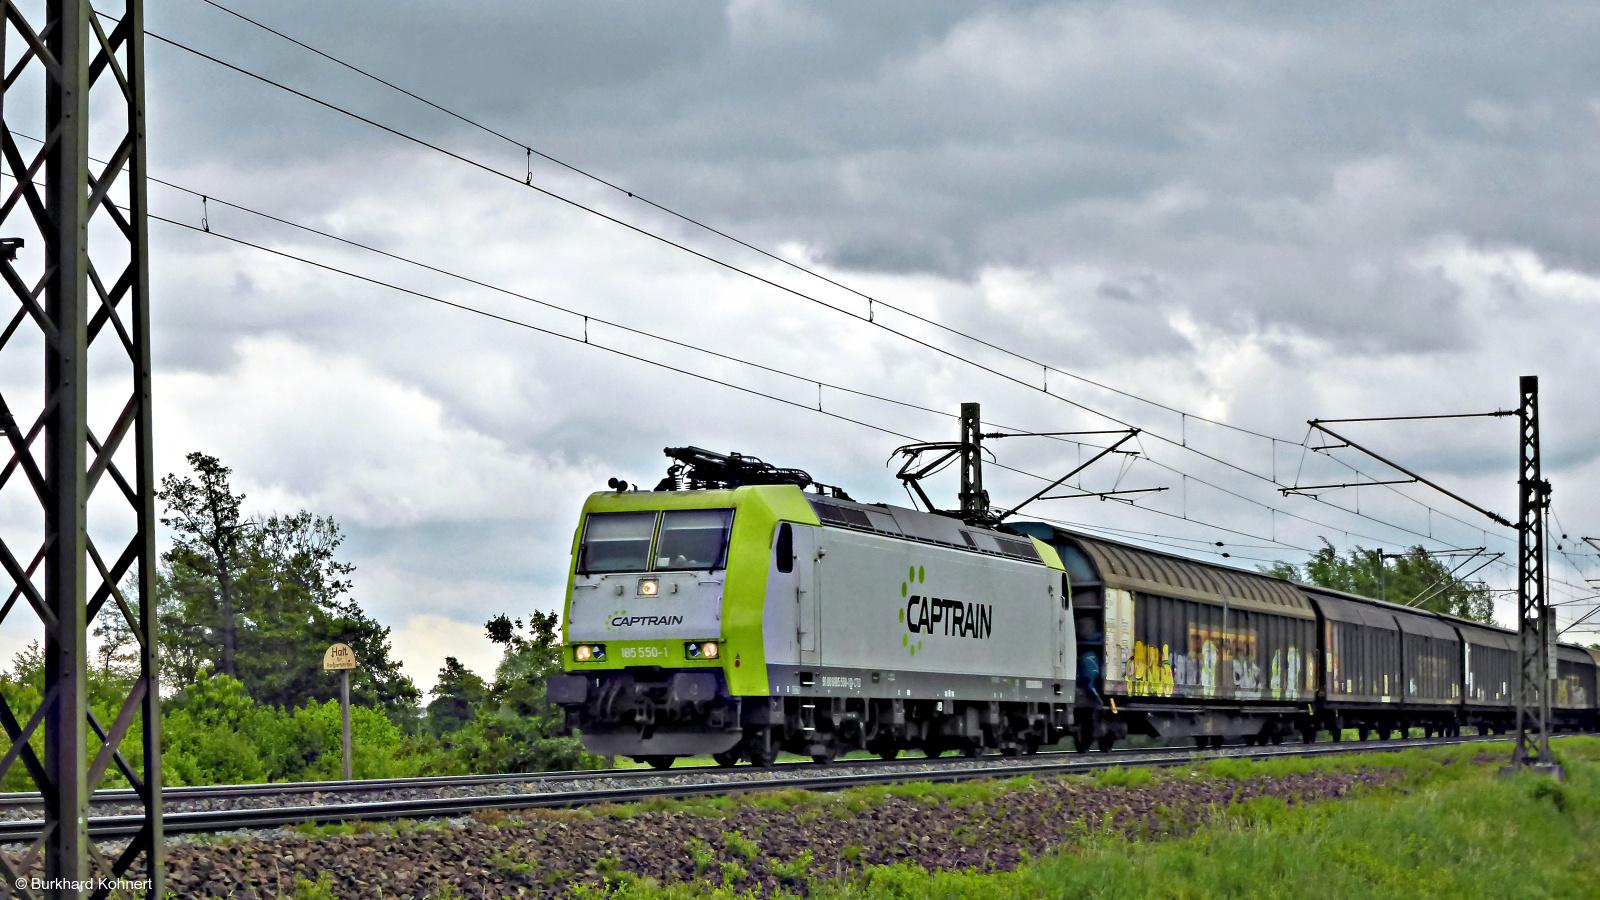 185 550-1 Captrain